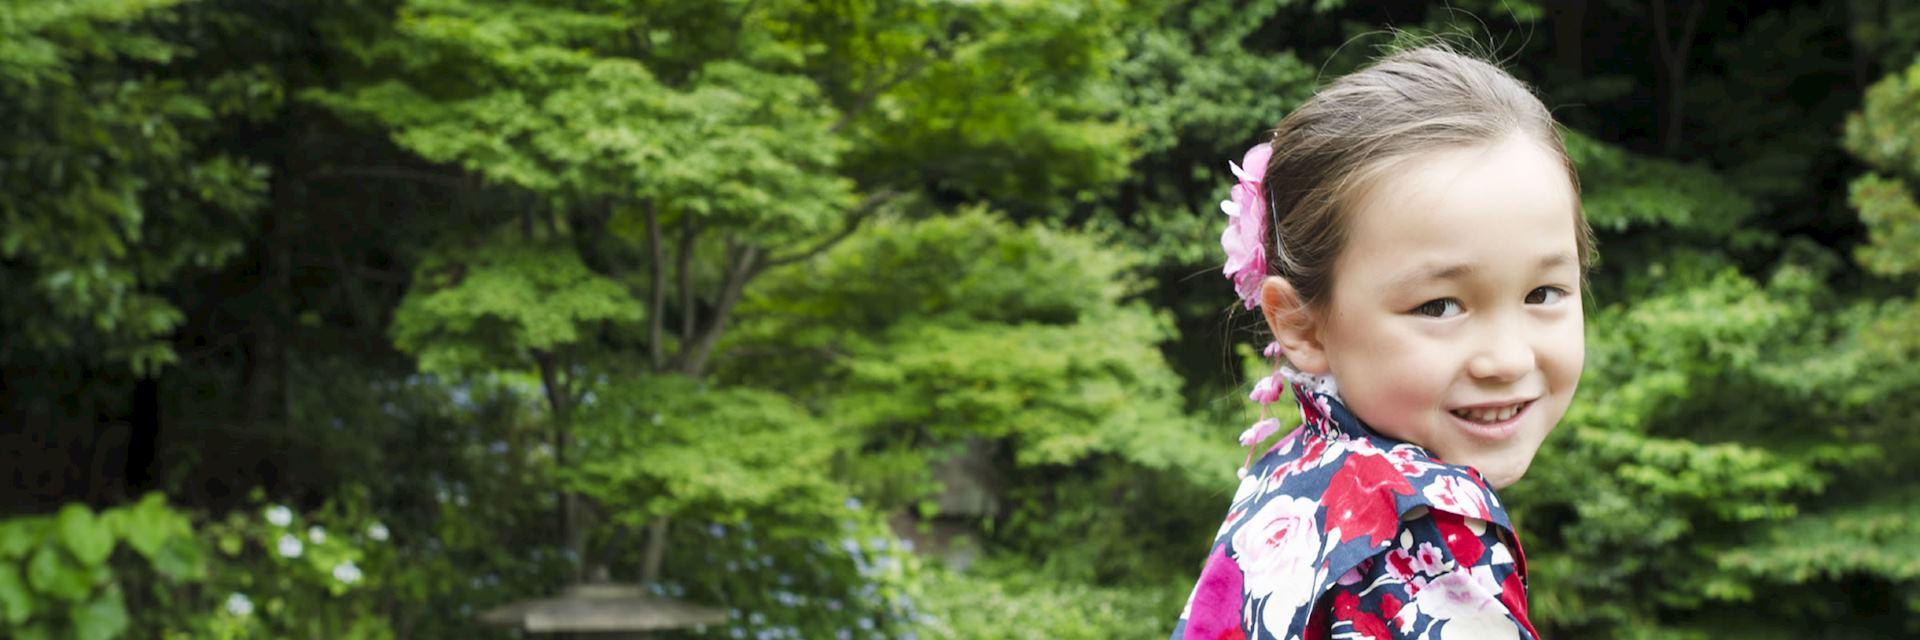 Japanese girl in traditional kimono dress